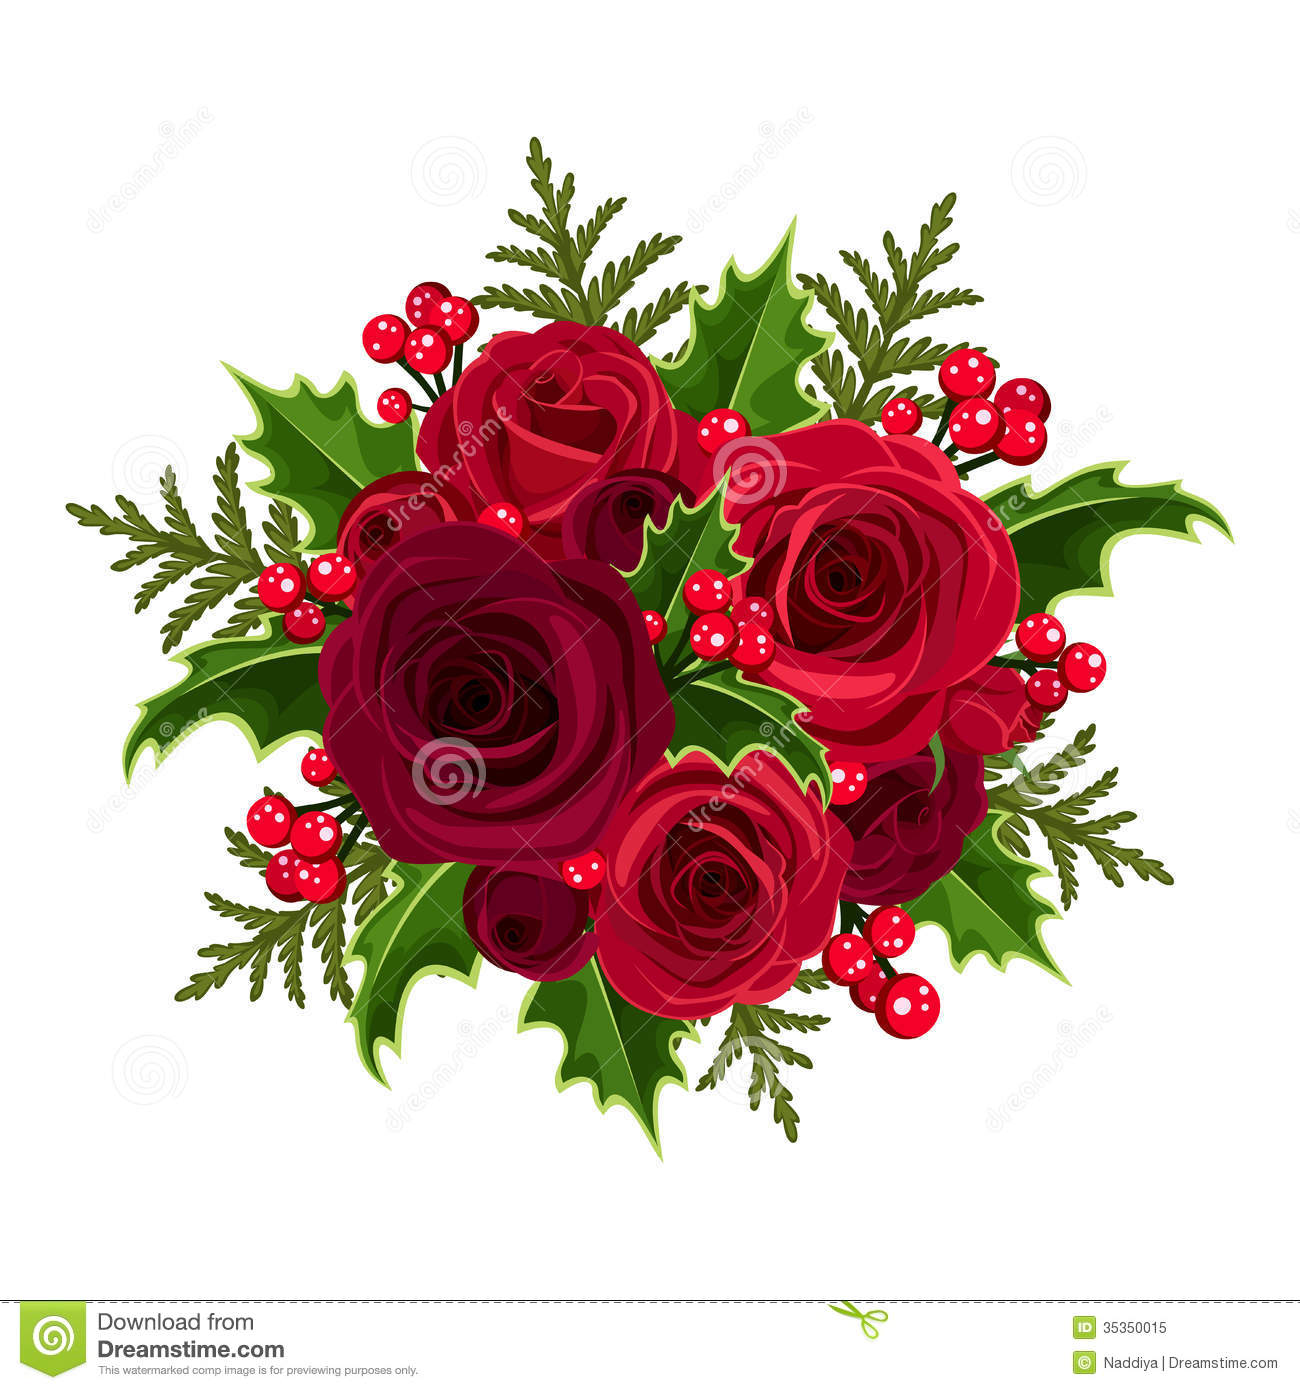 Bouquet clipart dozen rose Roses Collection Dozen of Of